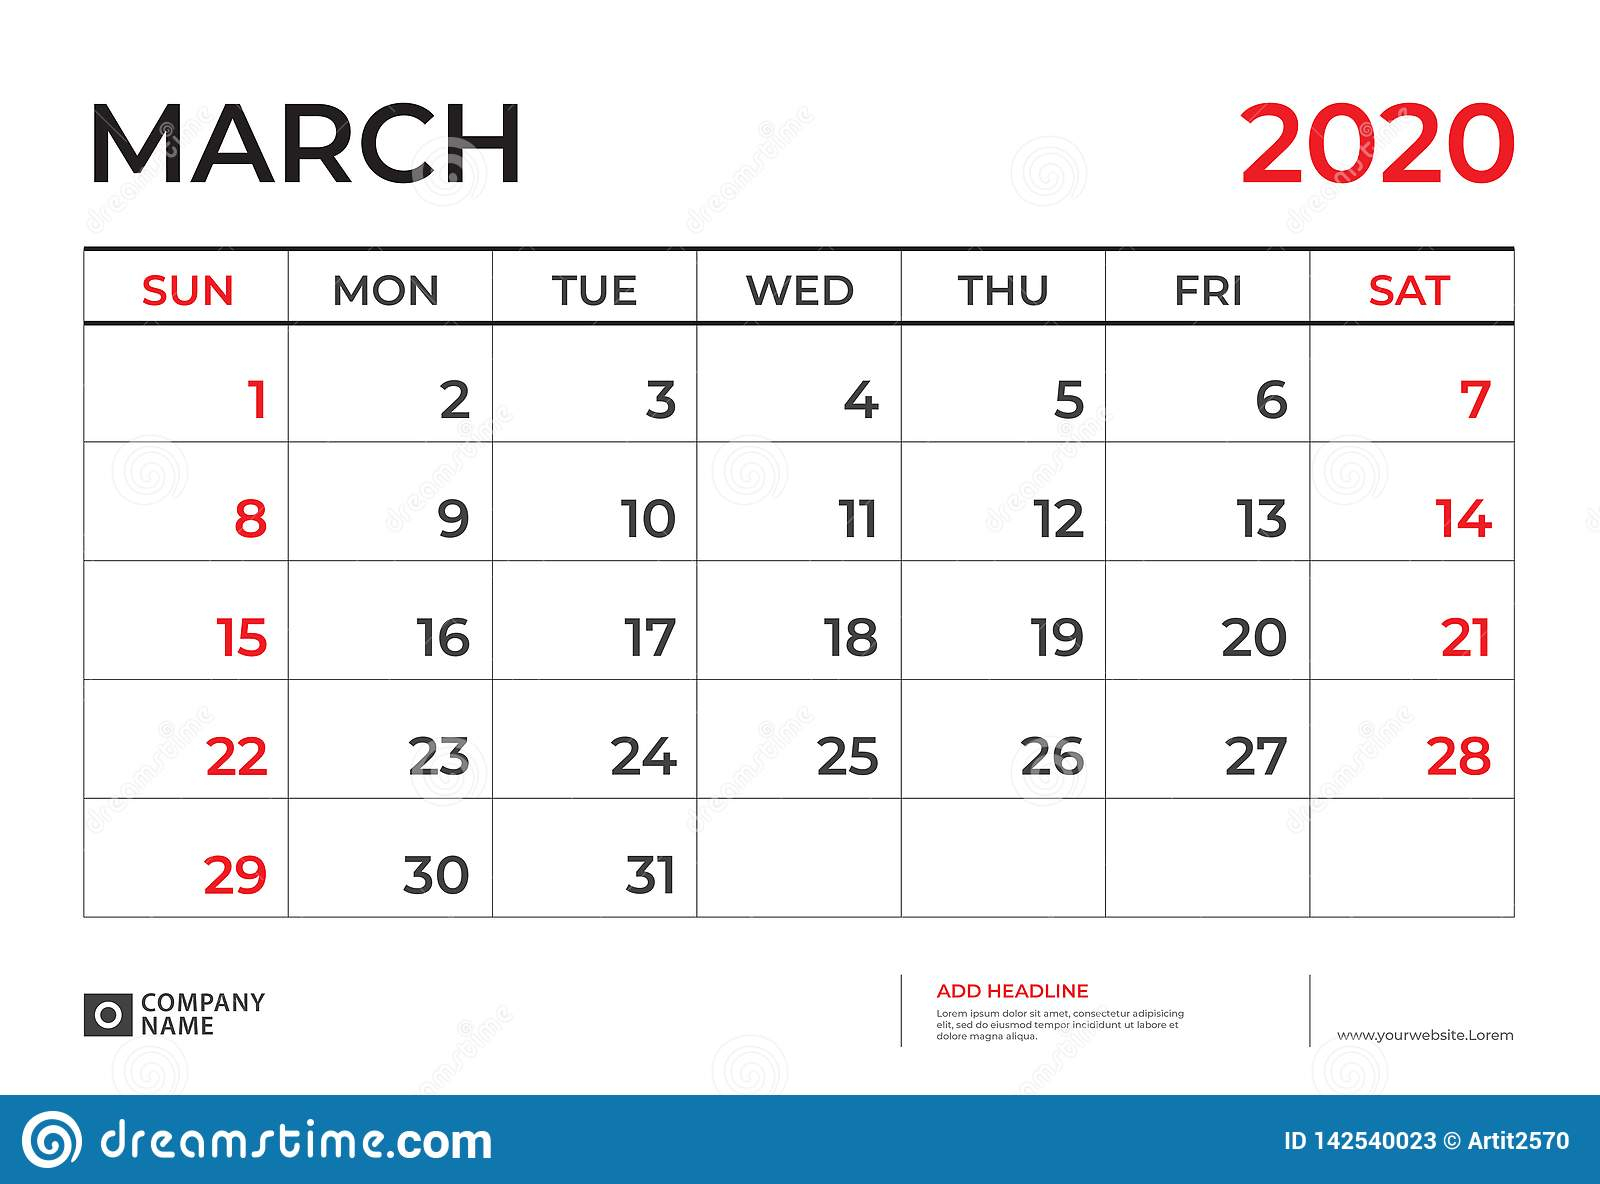 Шаблон Календаря Марта 2020, Размер 9 Плана Настольного intended for Kalendar Kuda March 2020